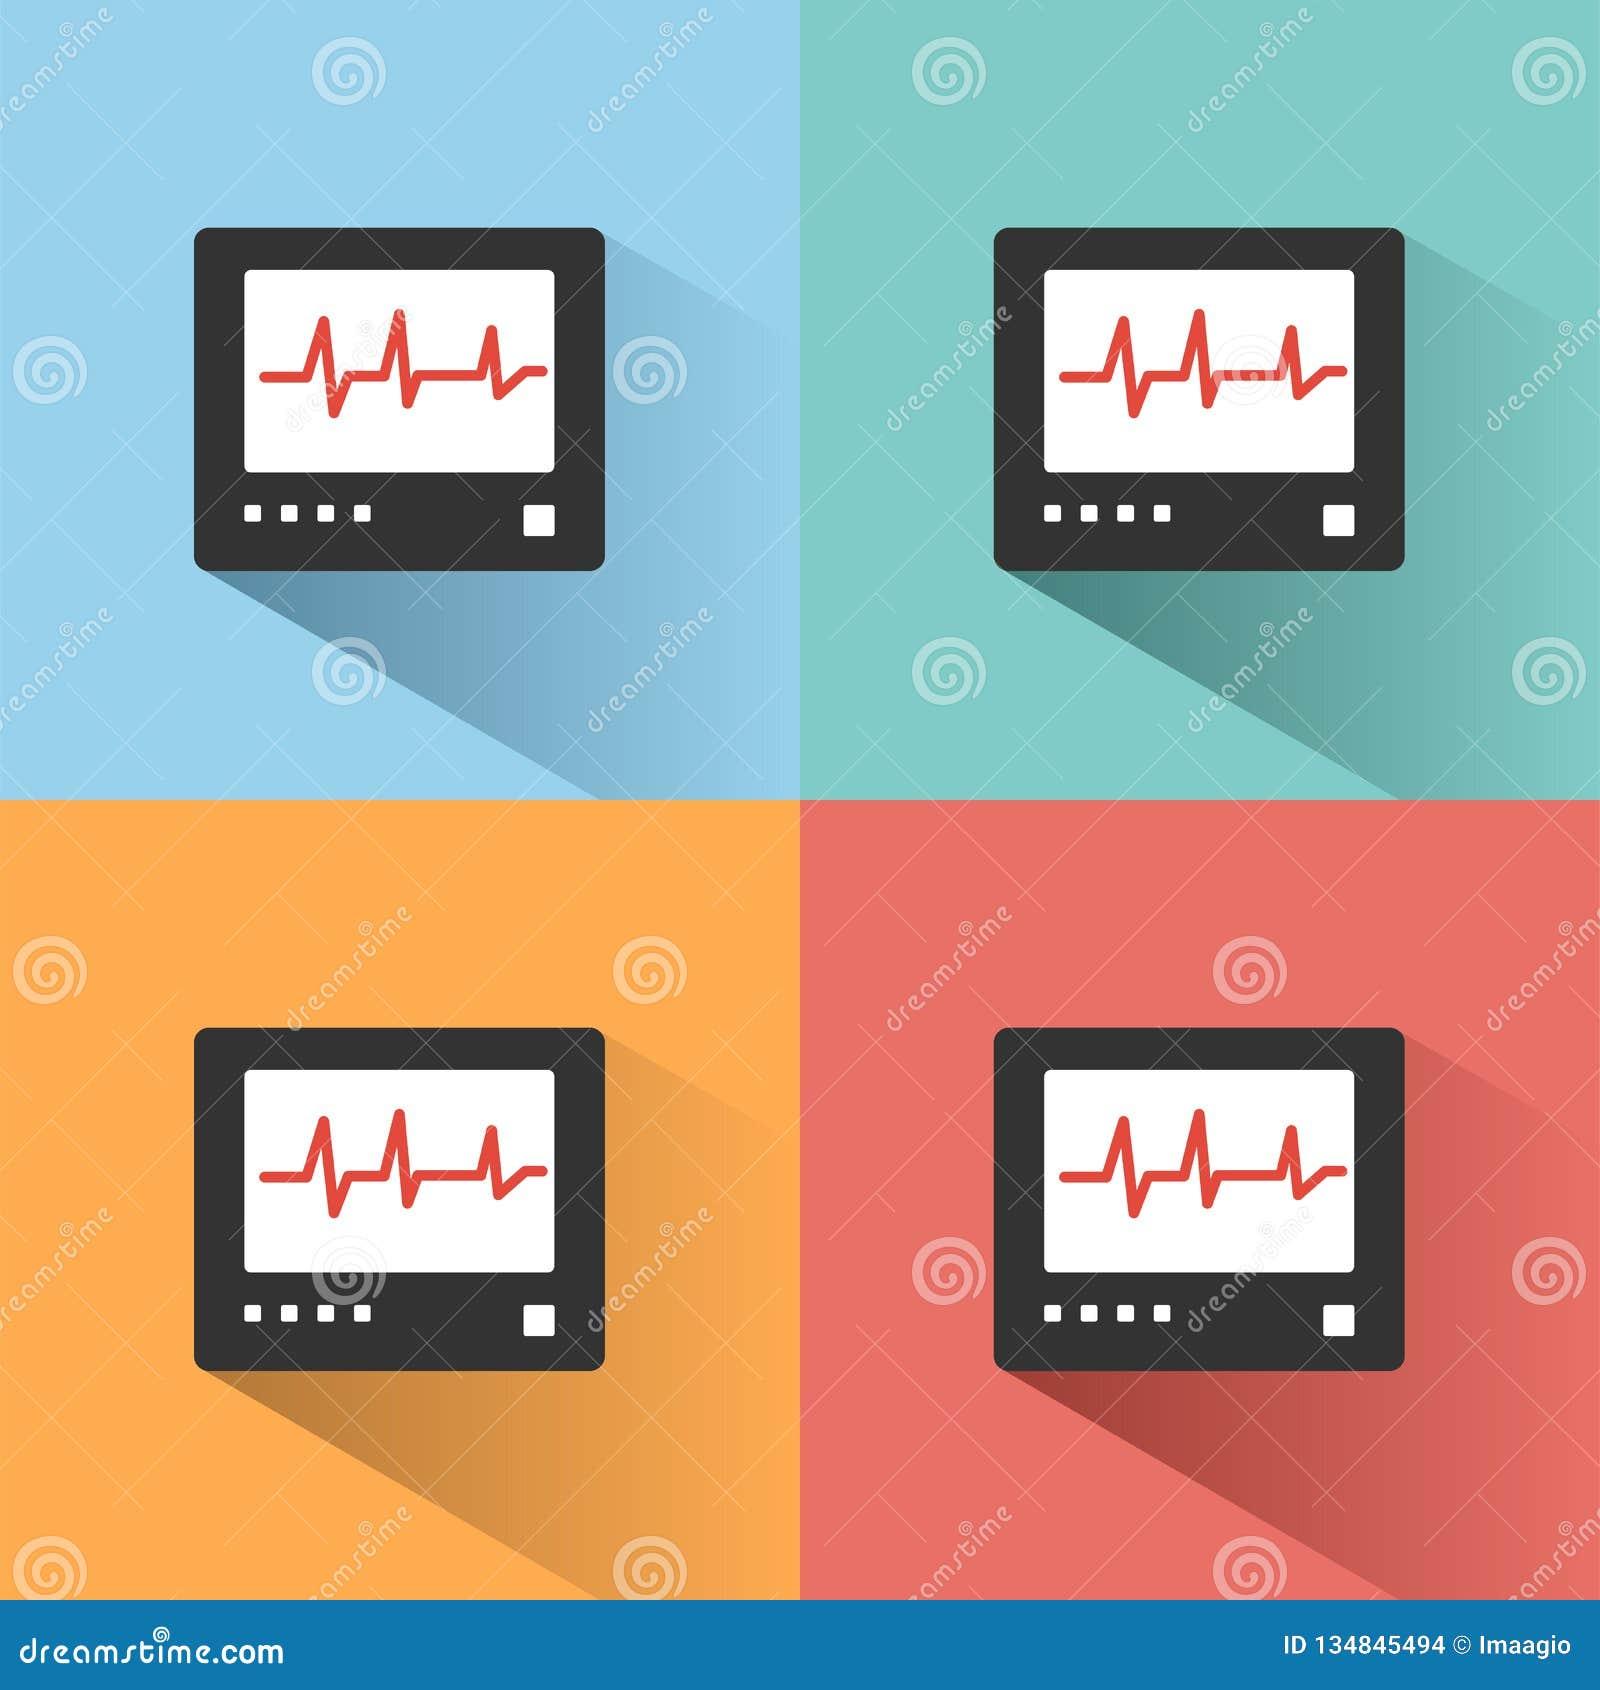 E heartbeat